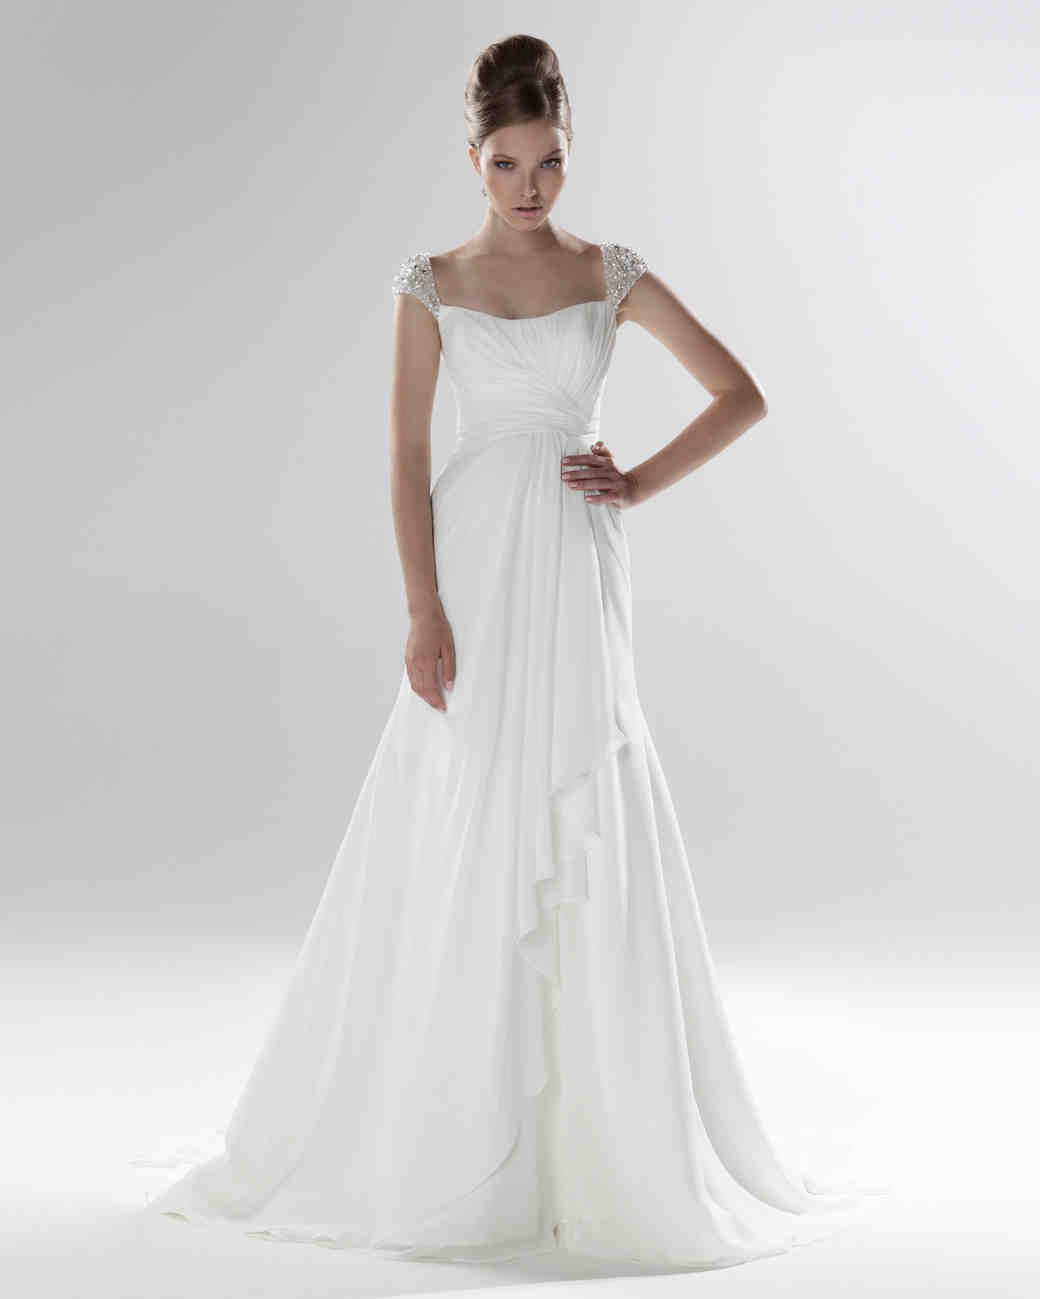 ellis-bridal-11187.jpg